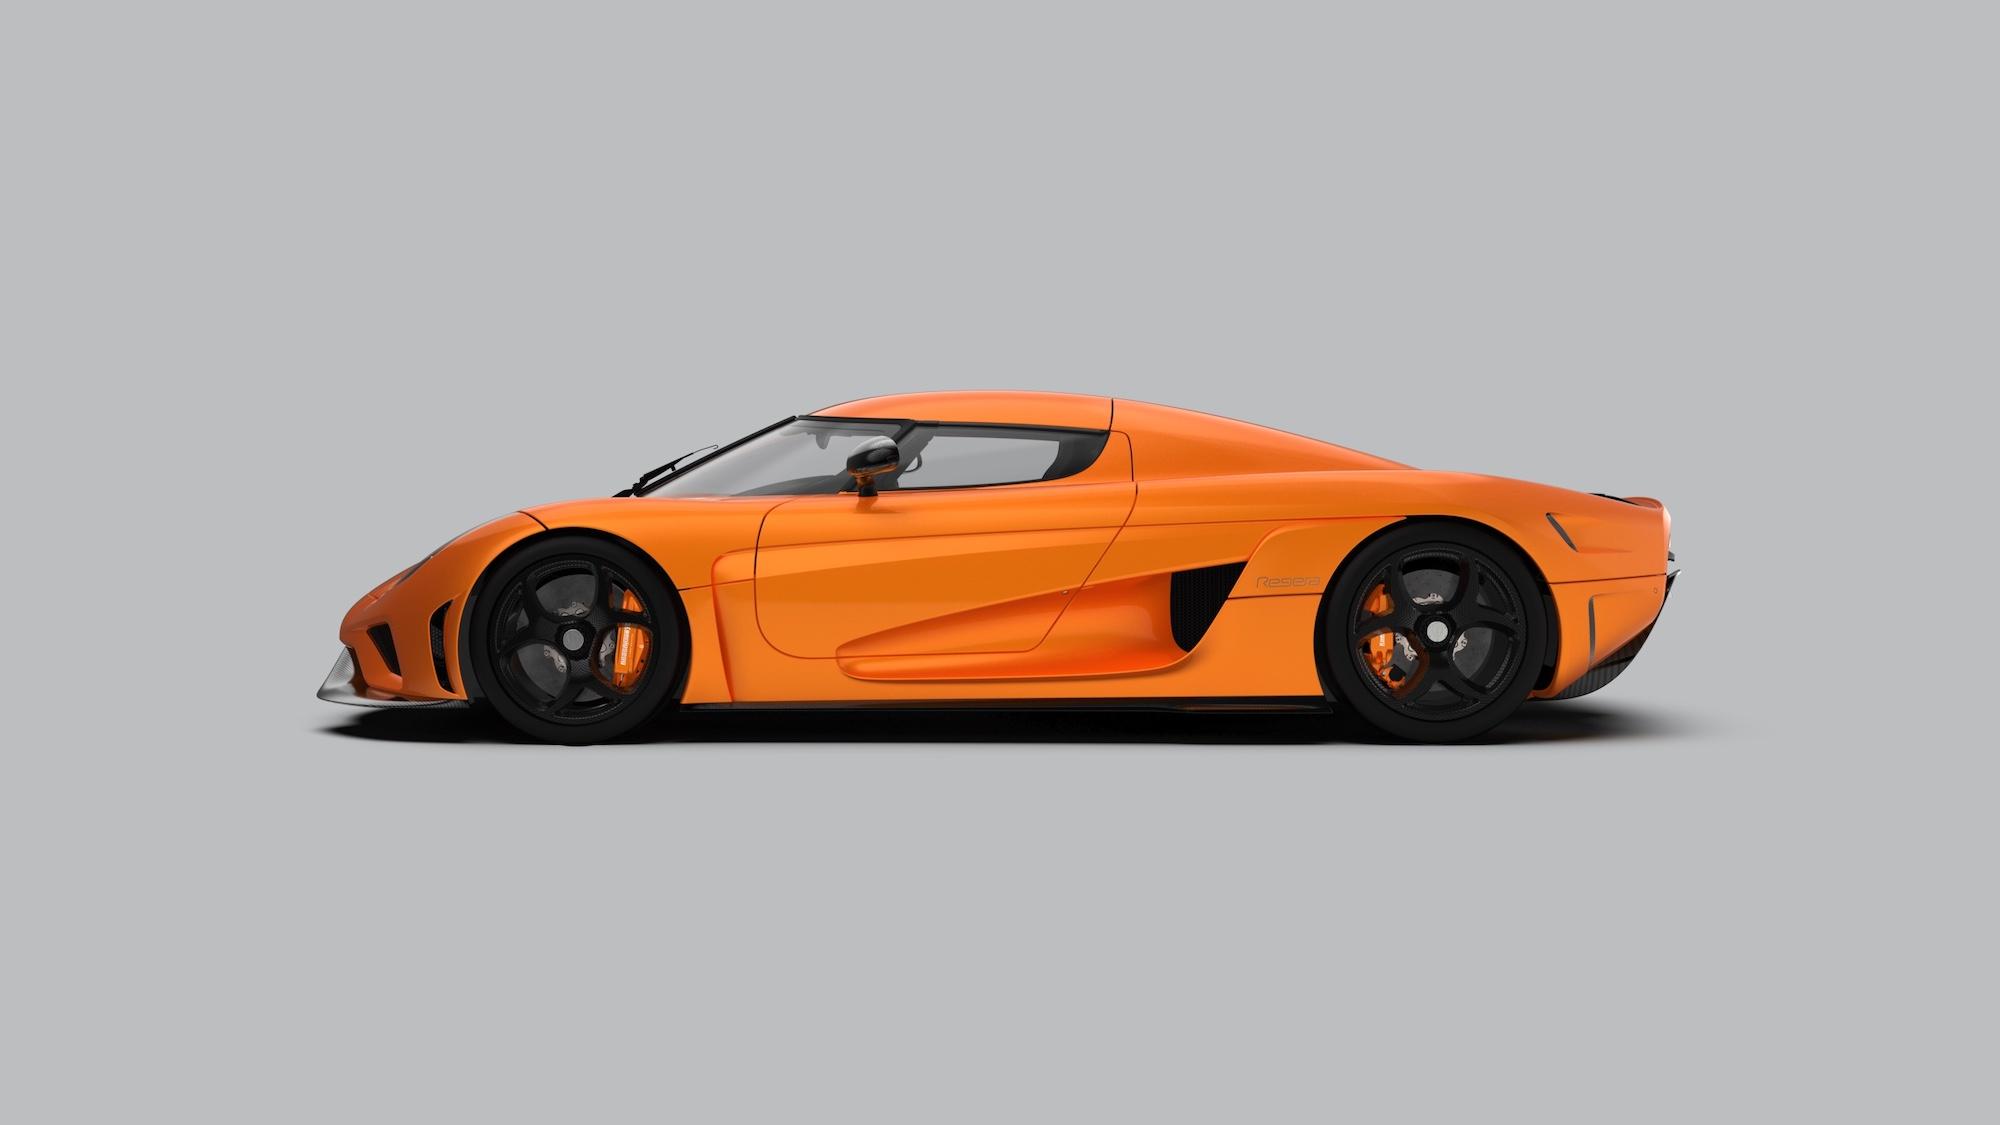 orange Koenigsegg Regera image